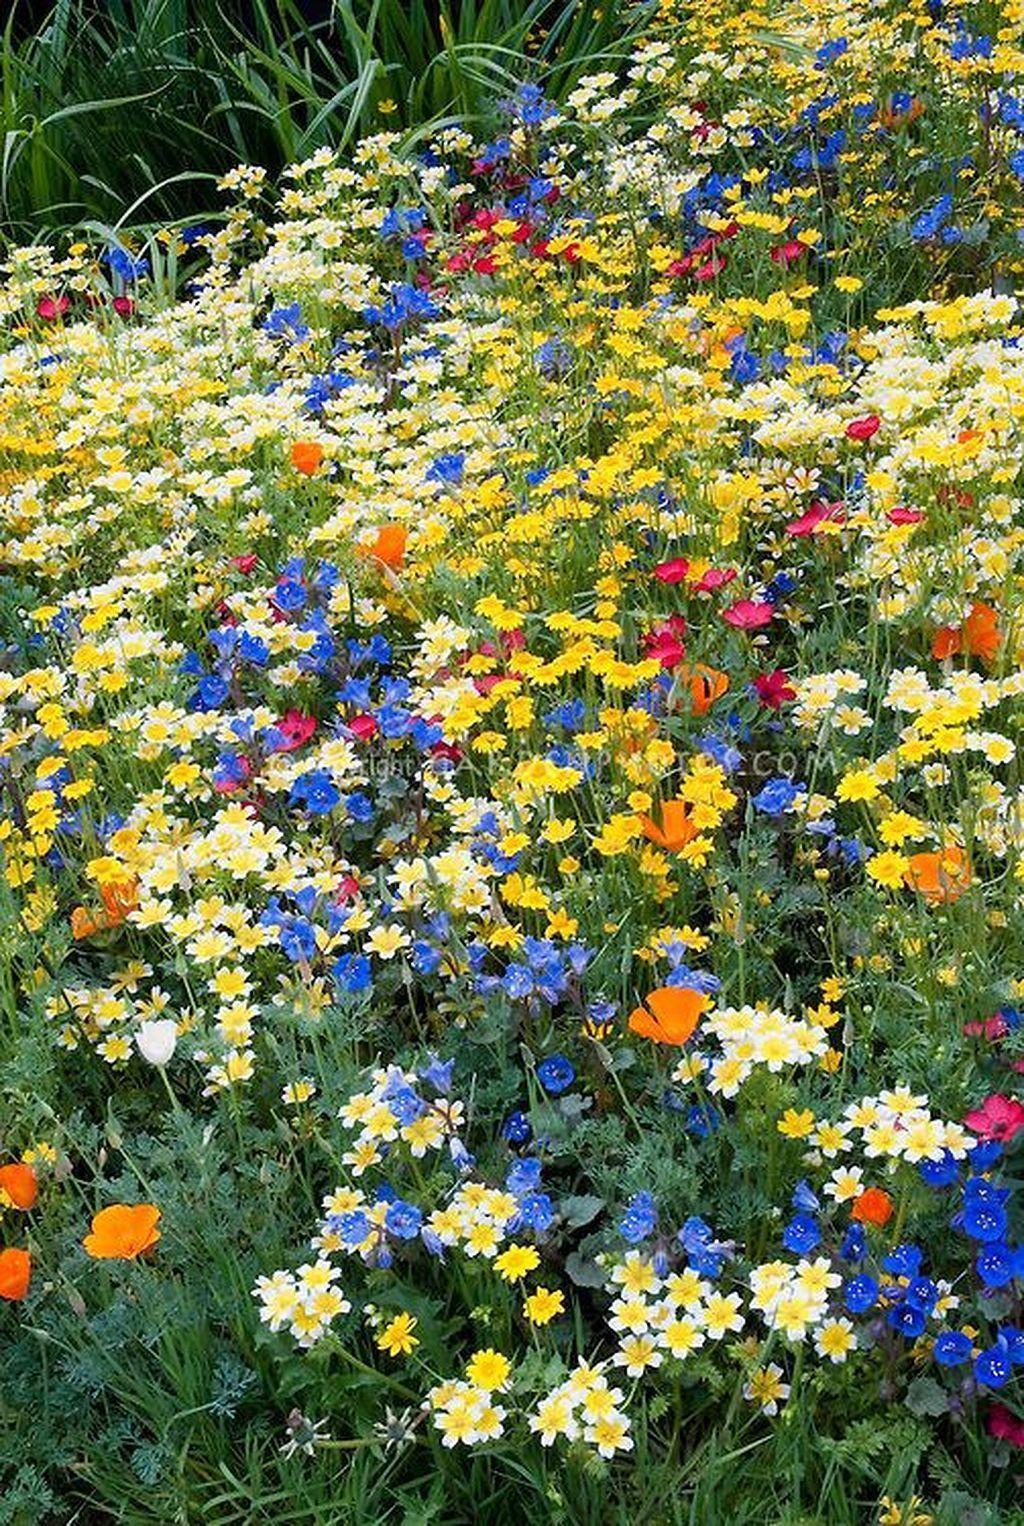 Beautiful wild flower garden #wildflowers